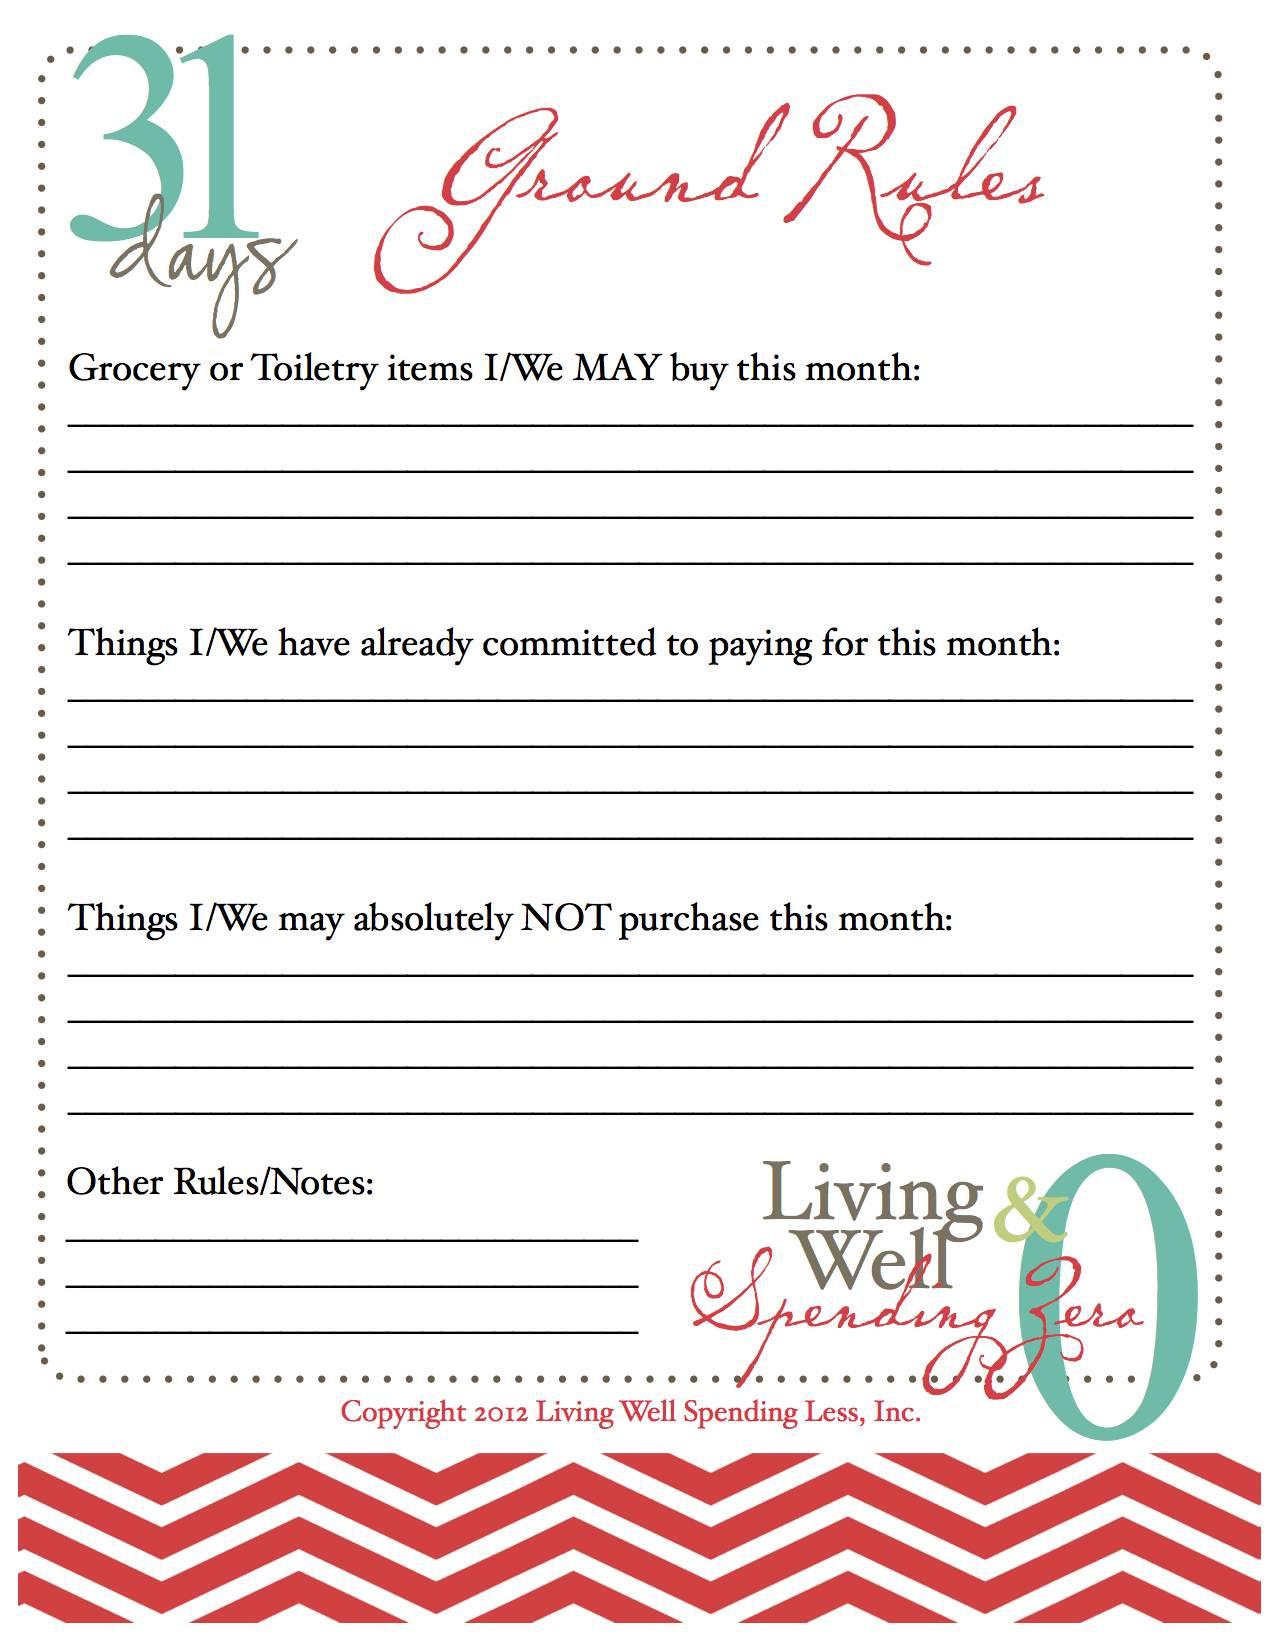 October Challenge Spending Freeze Living Better With